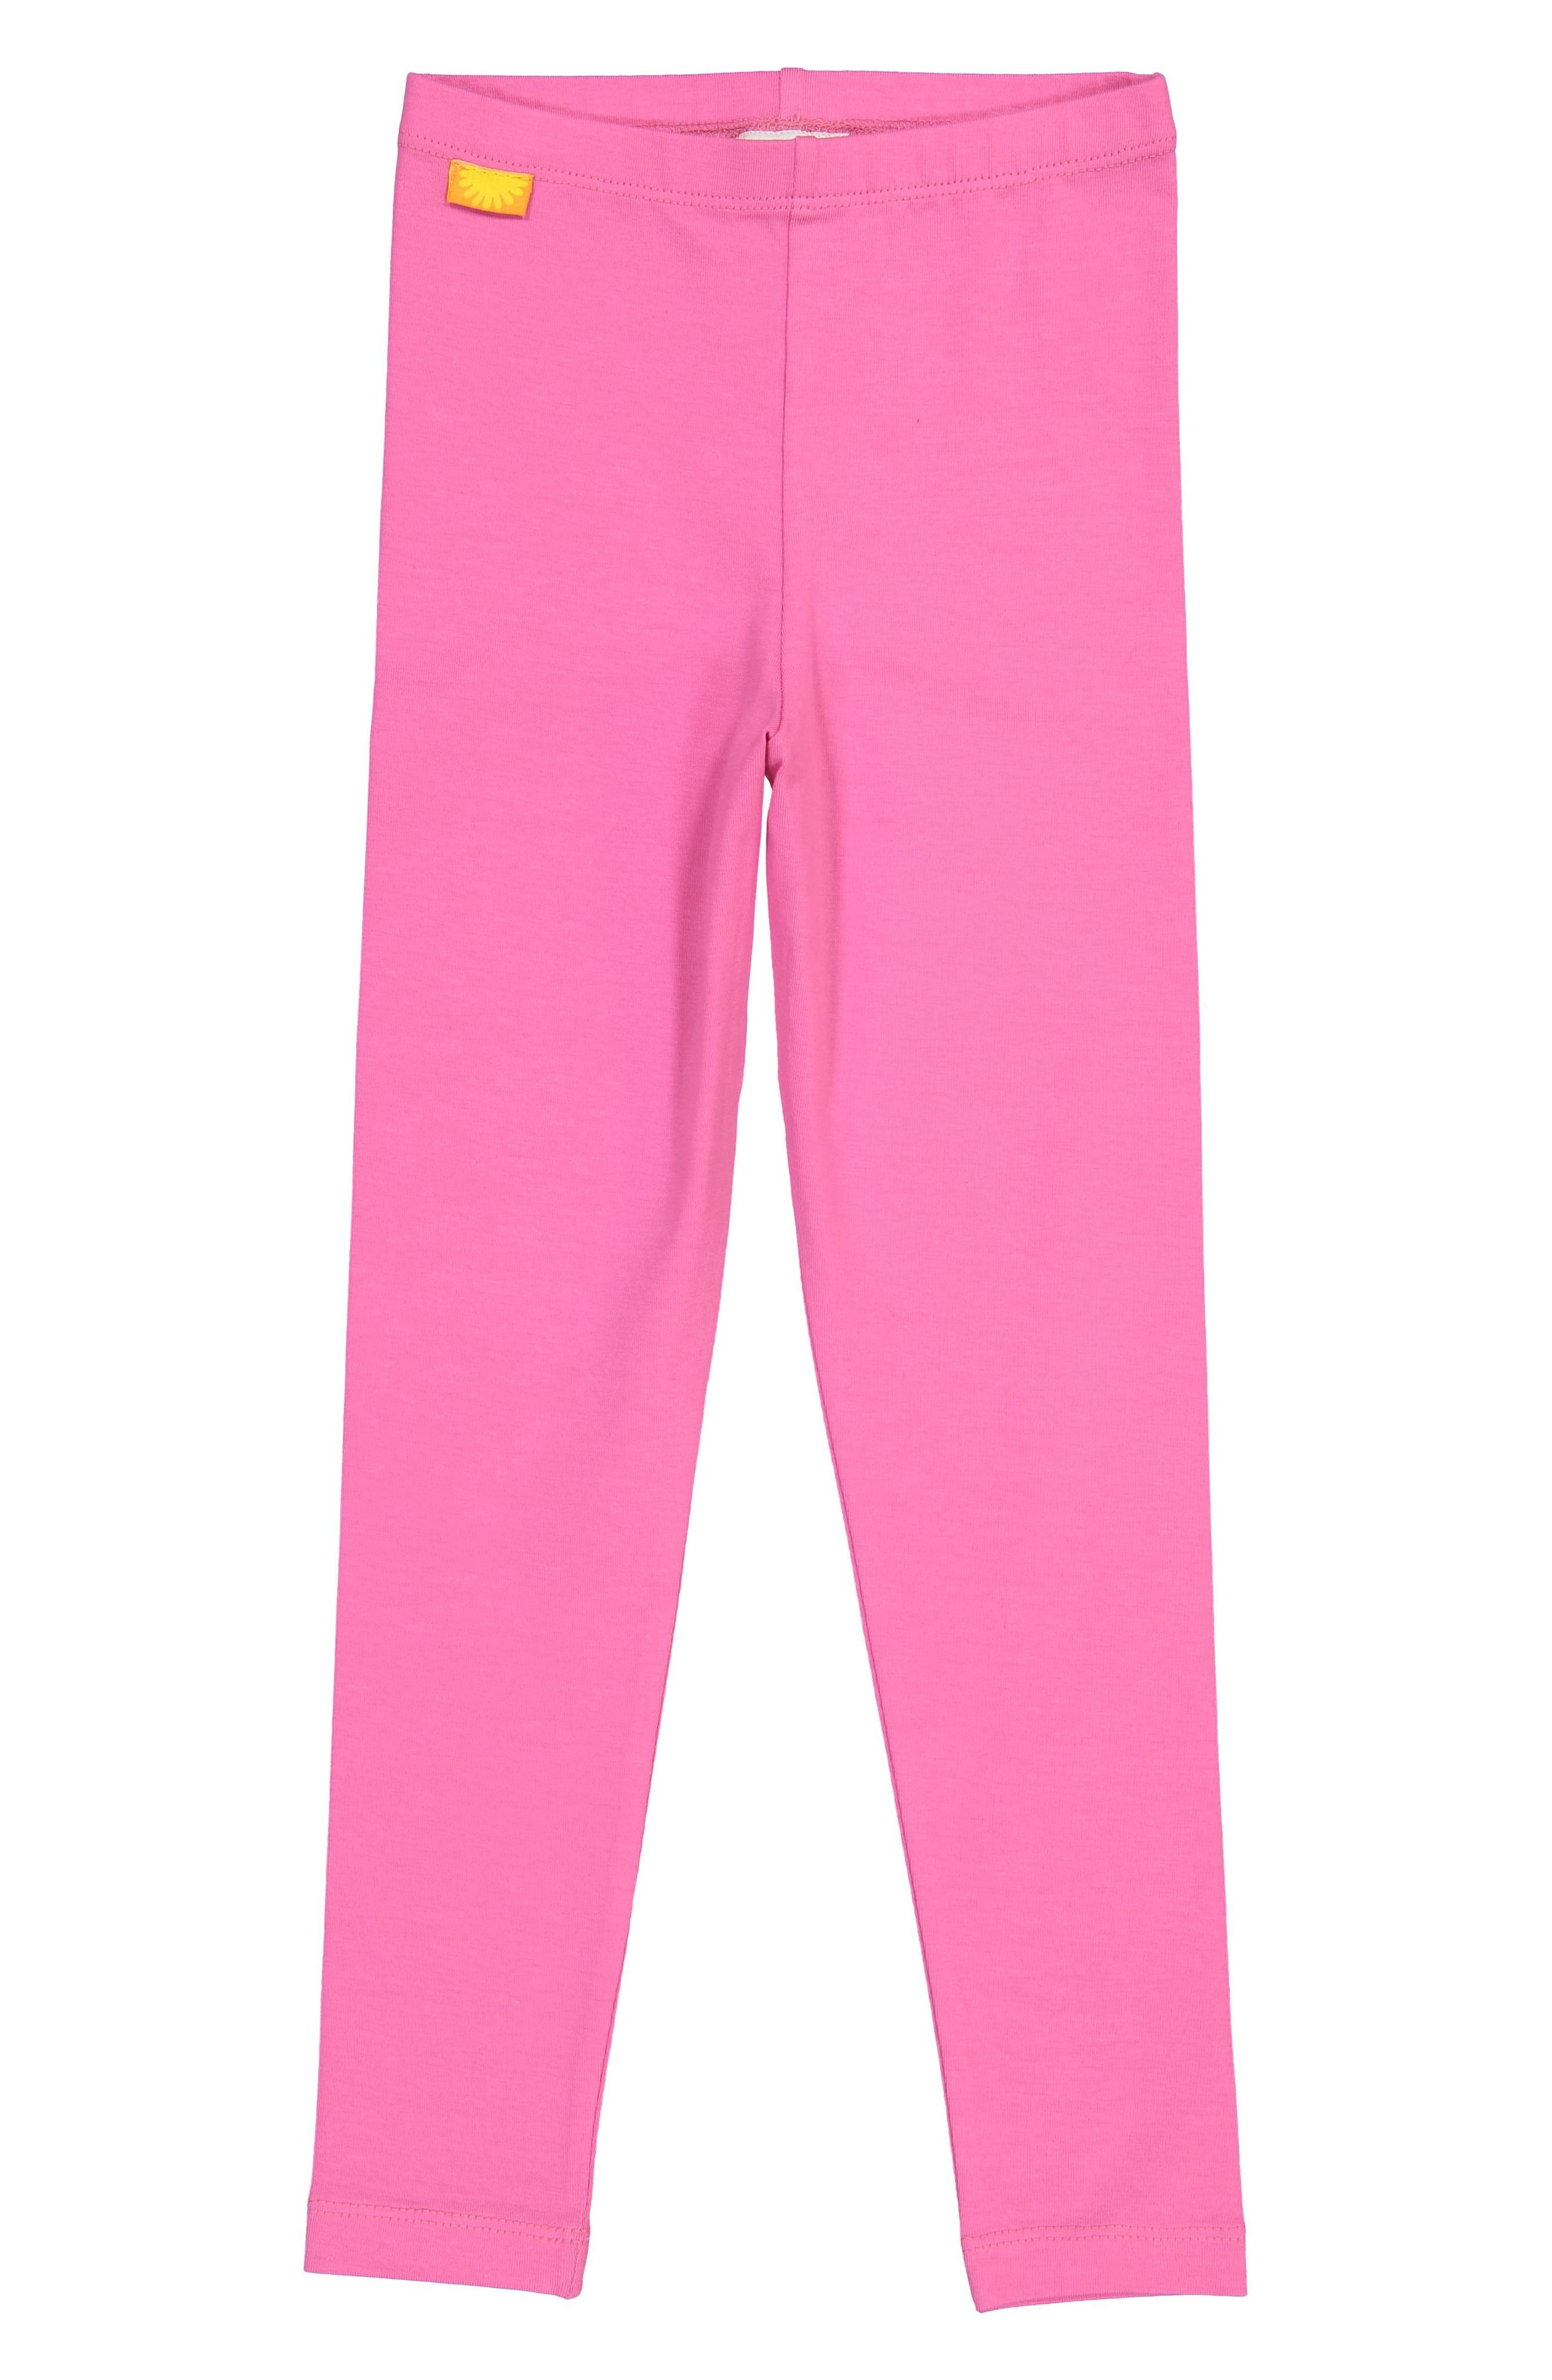 Organic Cotton Leggings,                         Main,                         color, PINK